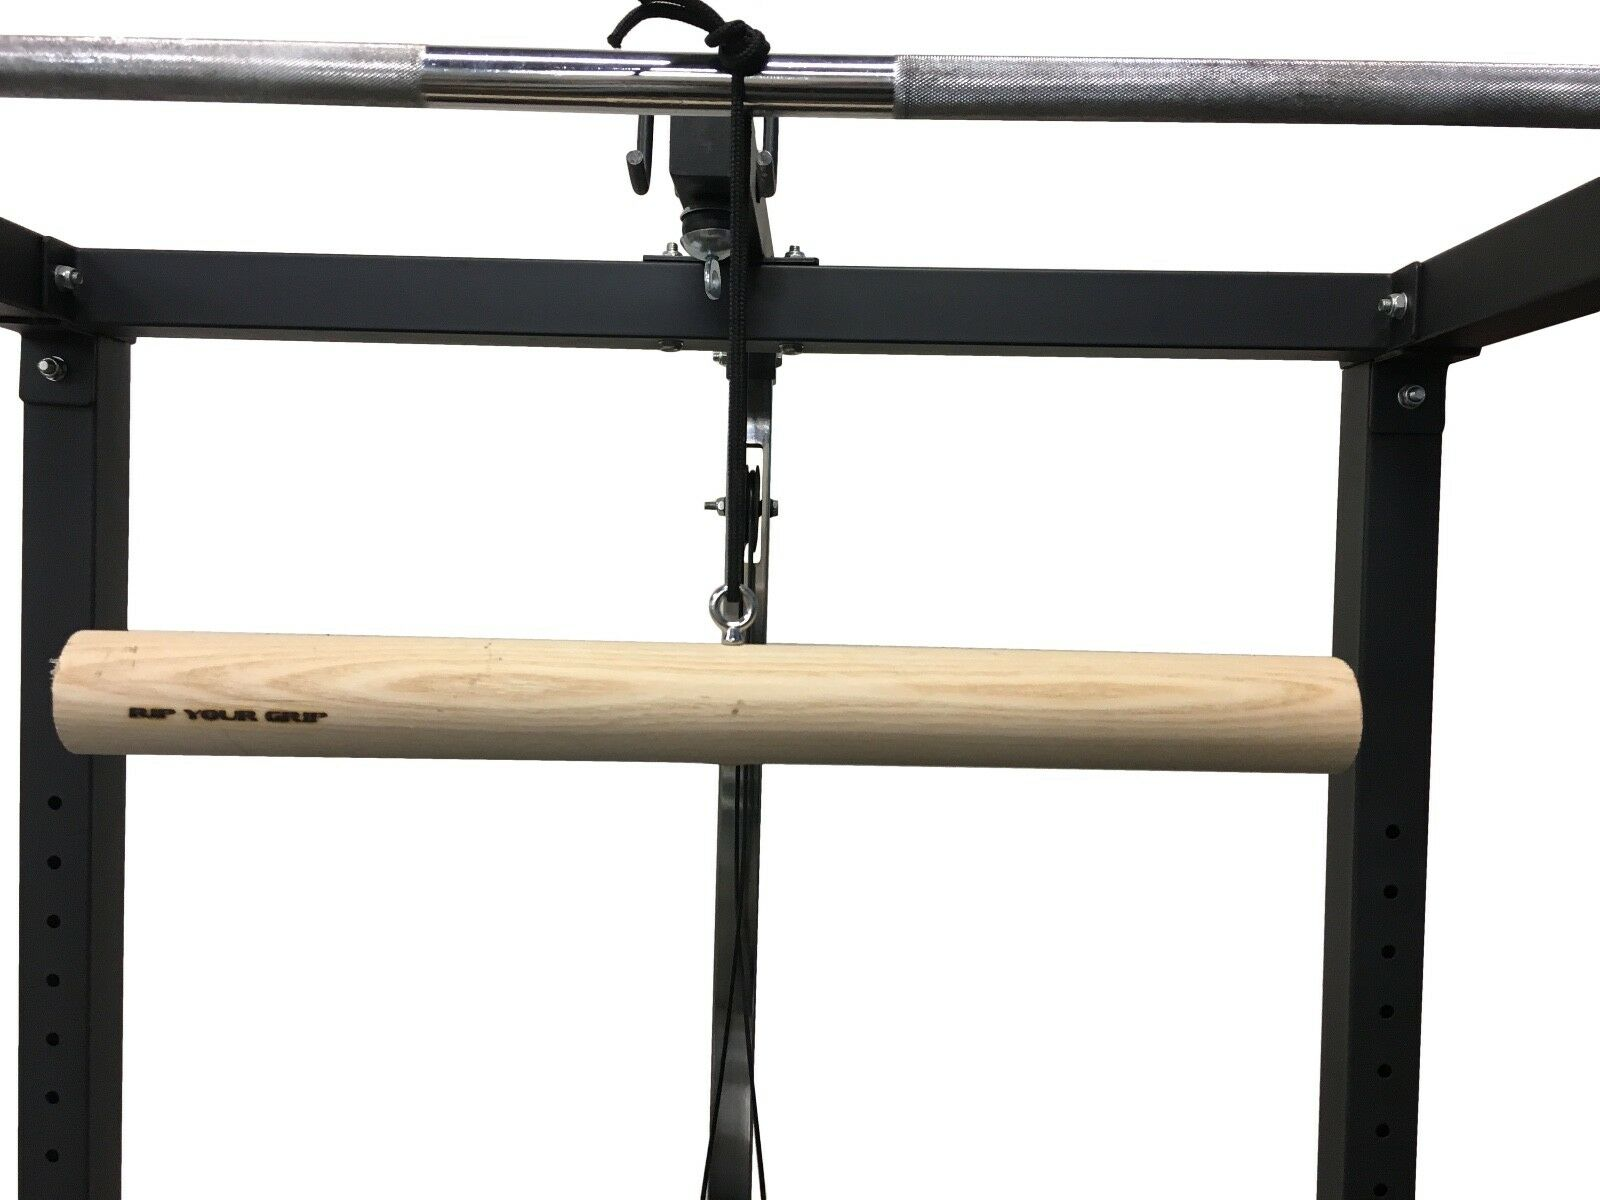 Unbalanced Wooden Bar 76mm - Fingerboard Pegboard Grip Grip Pegboard Grips Climbing Hold Fat b3ab20